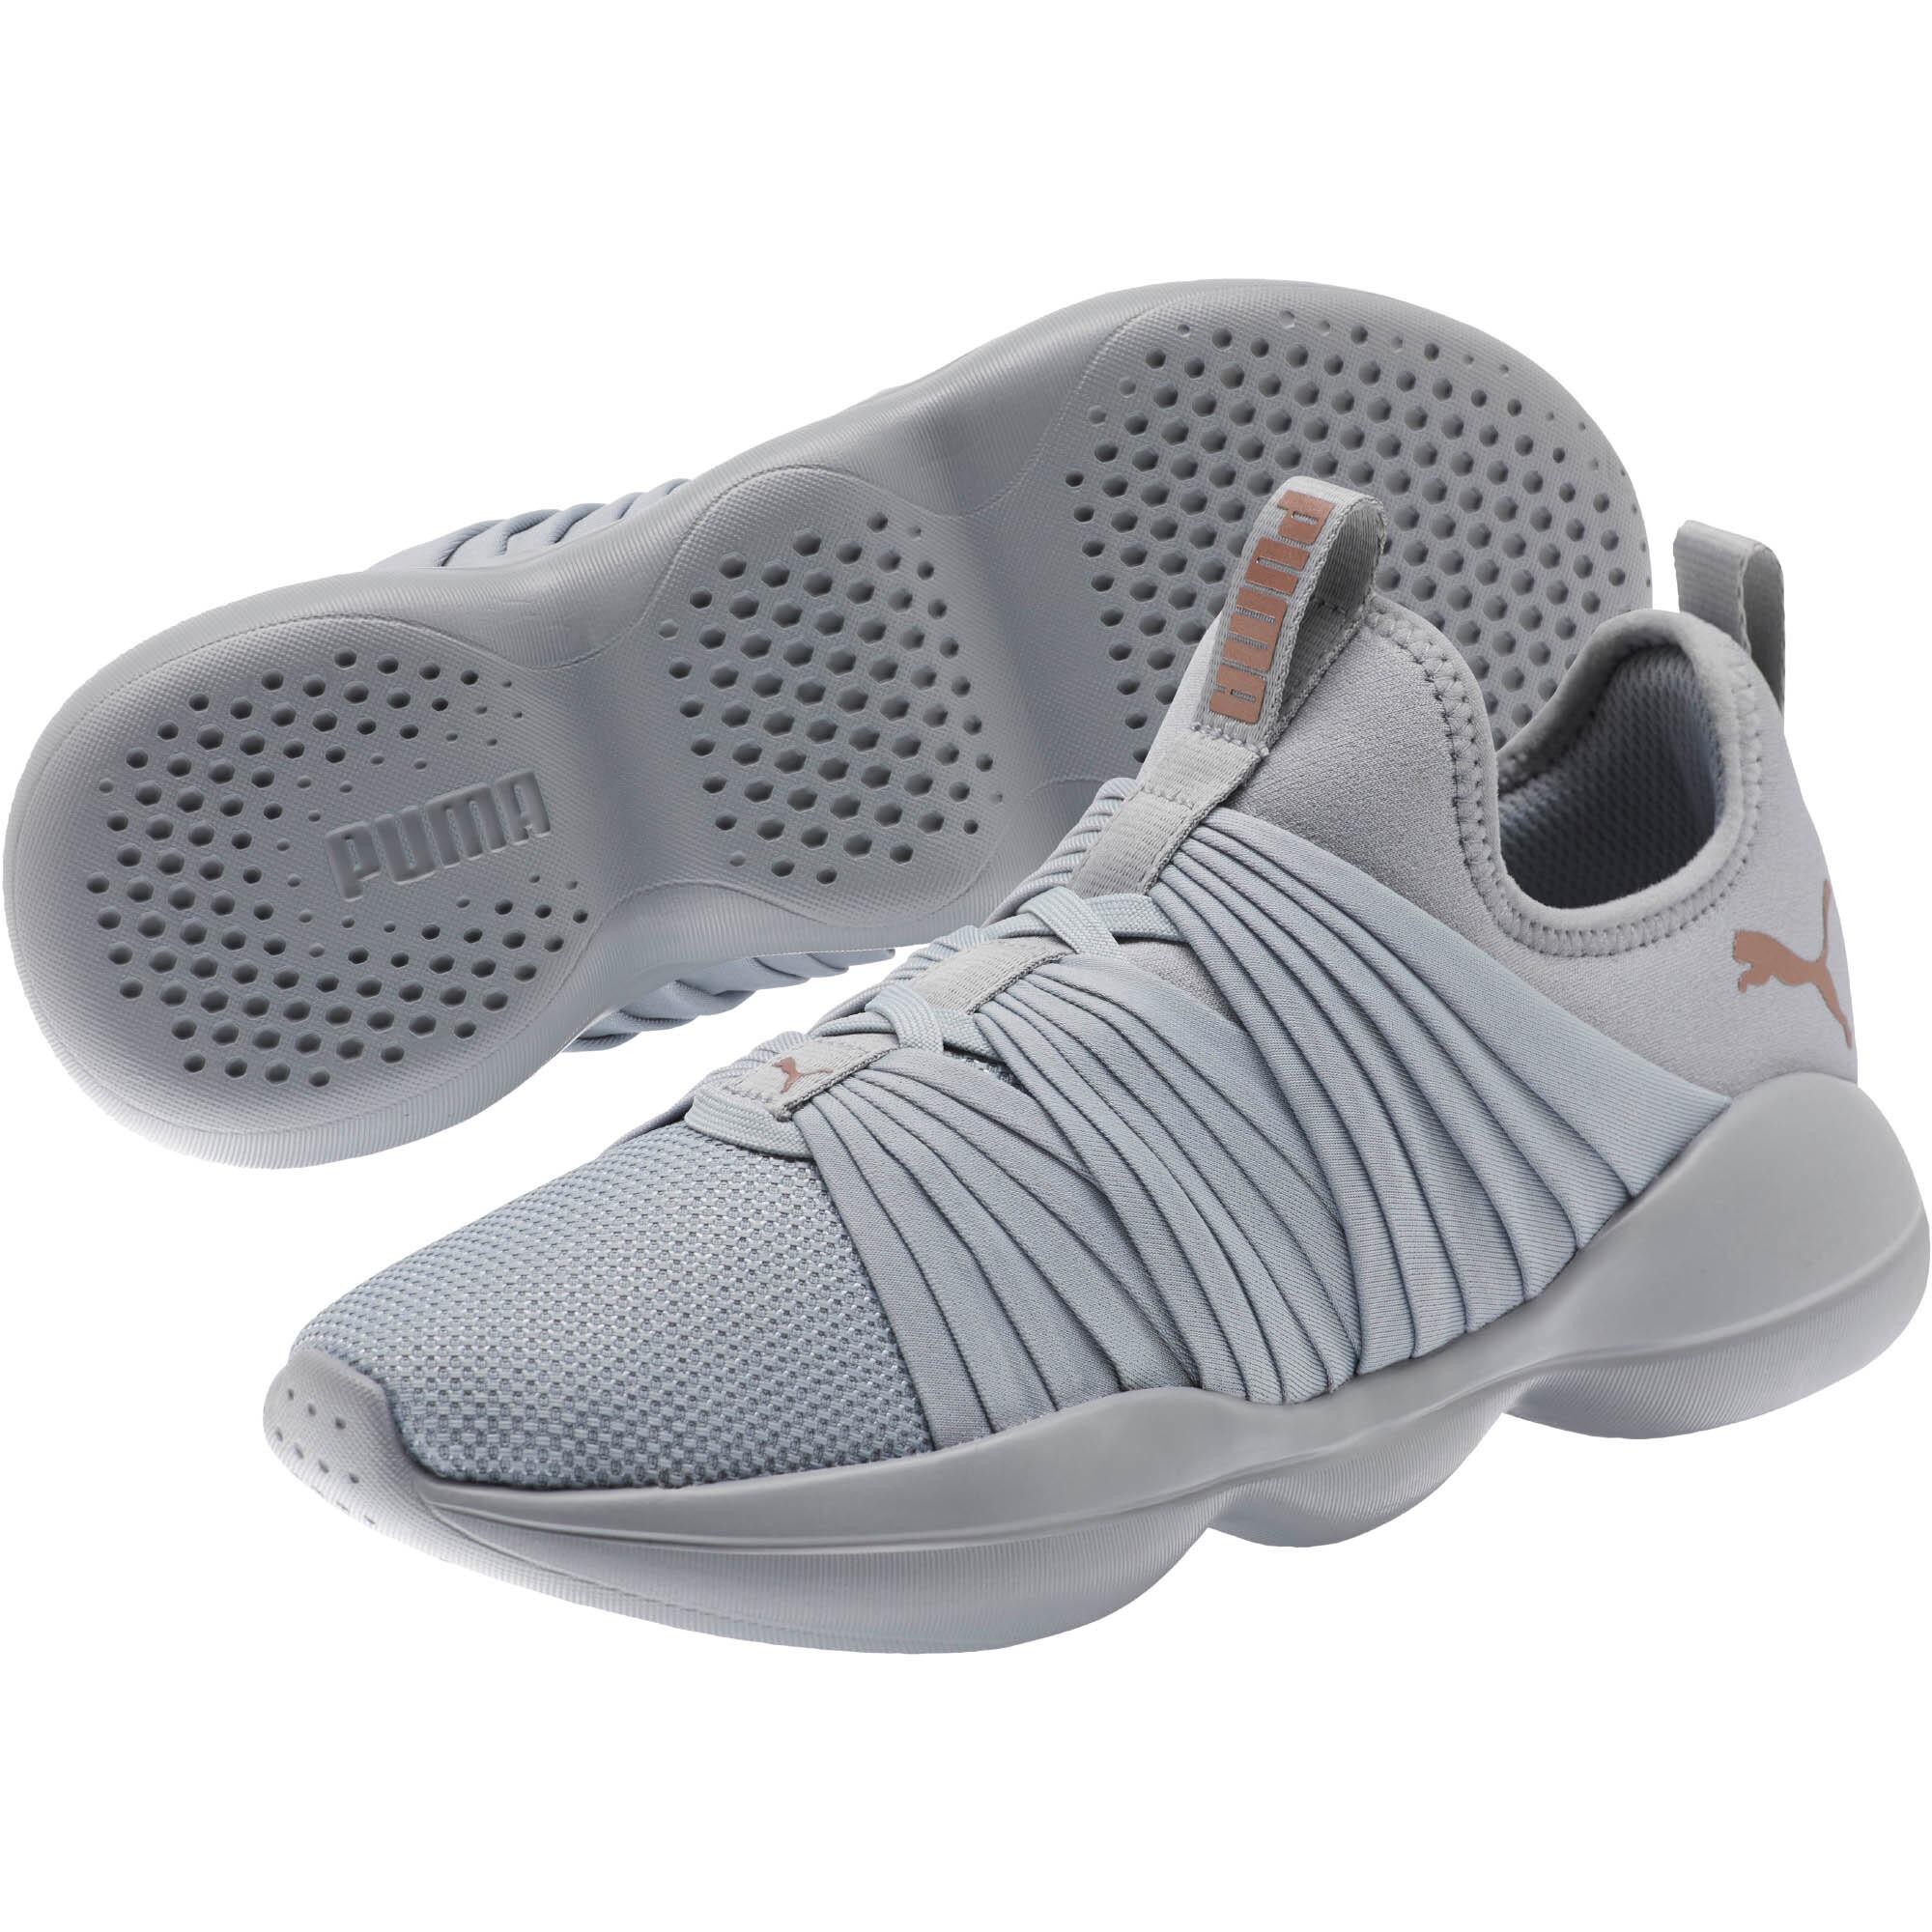 2acd5711f48 PUMA Flourish Stellar Women's Training Shoes Girls Shoe Running | eBay